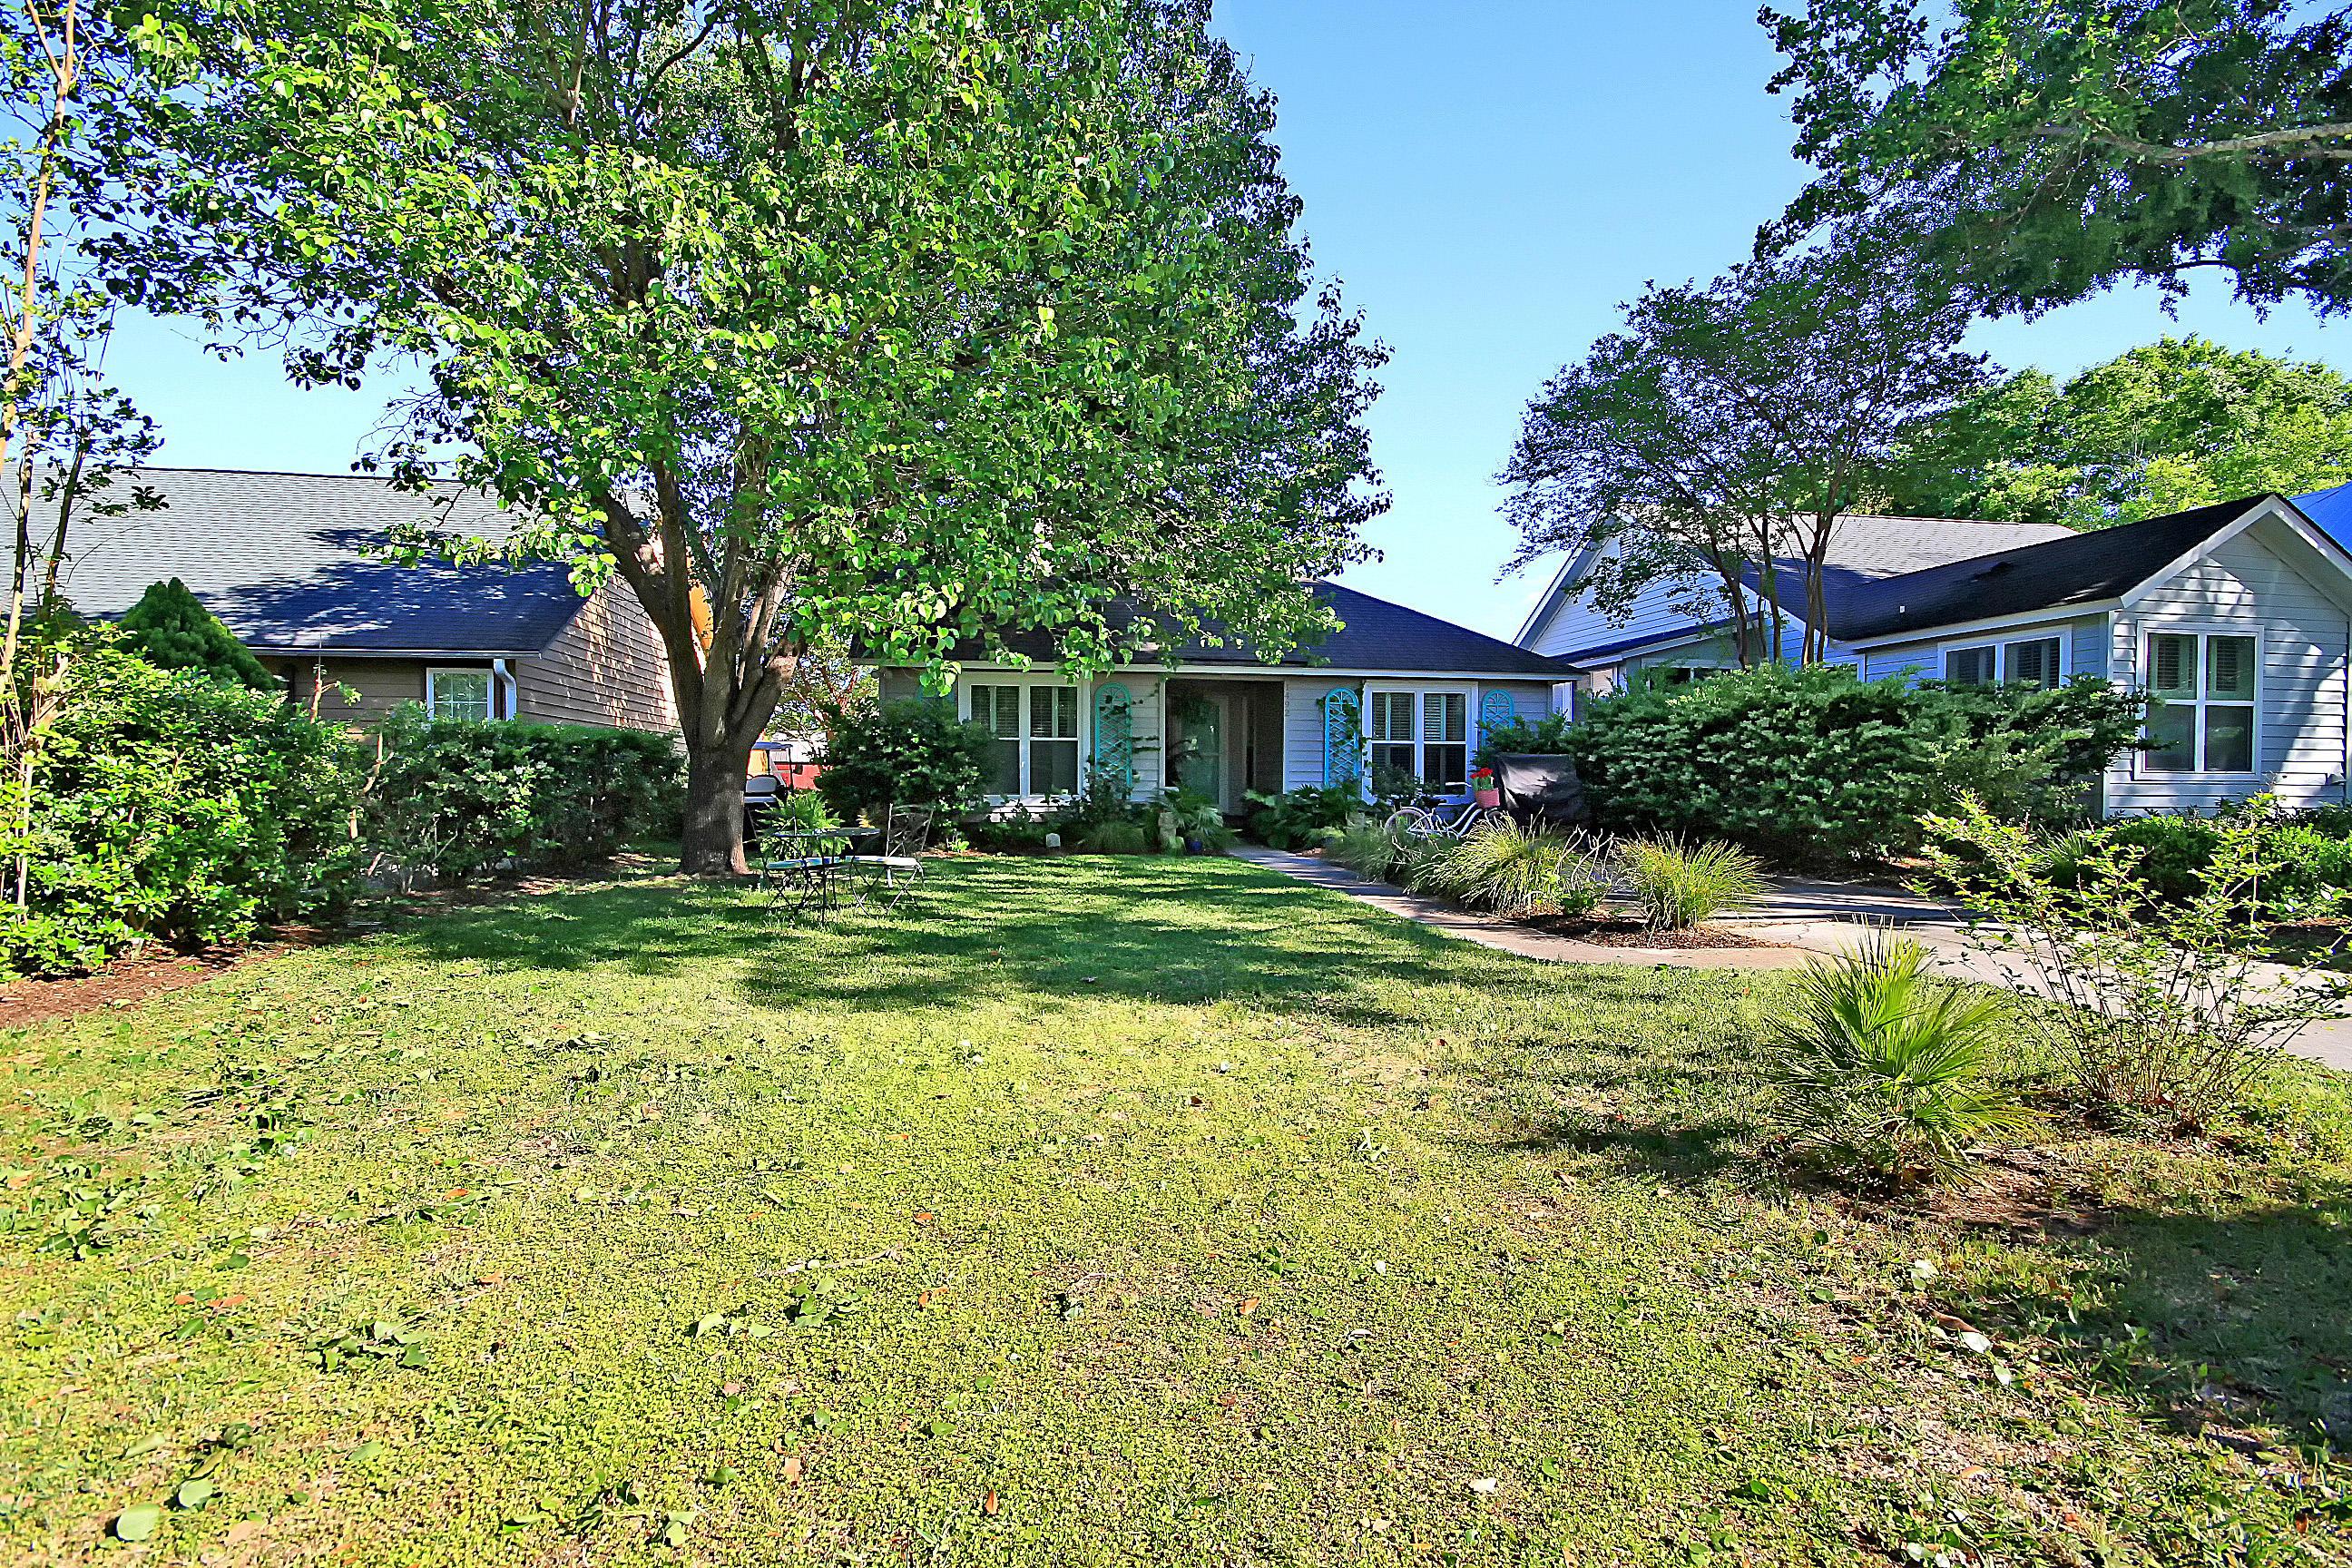 Pirates Cove Homes For Sale - 1492 Ketch, Mount Pleasant, SC - 19